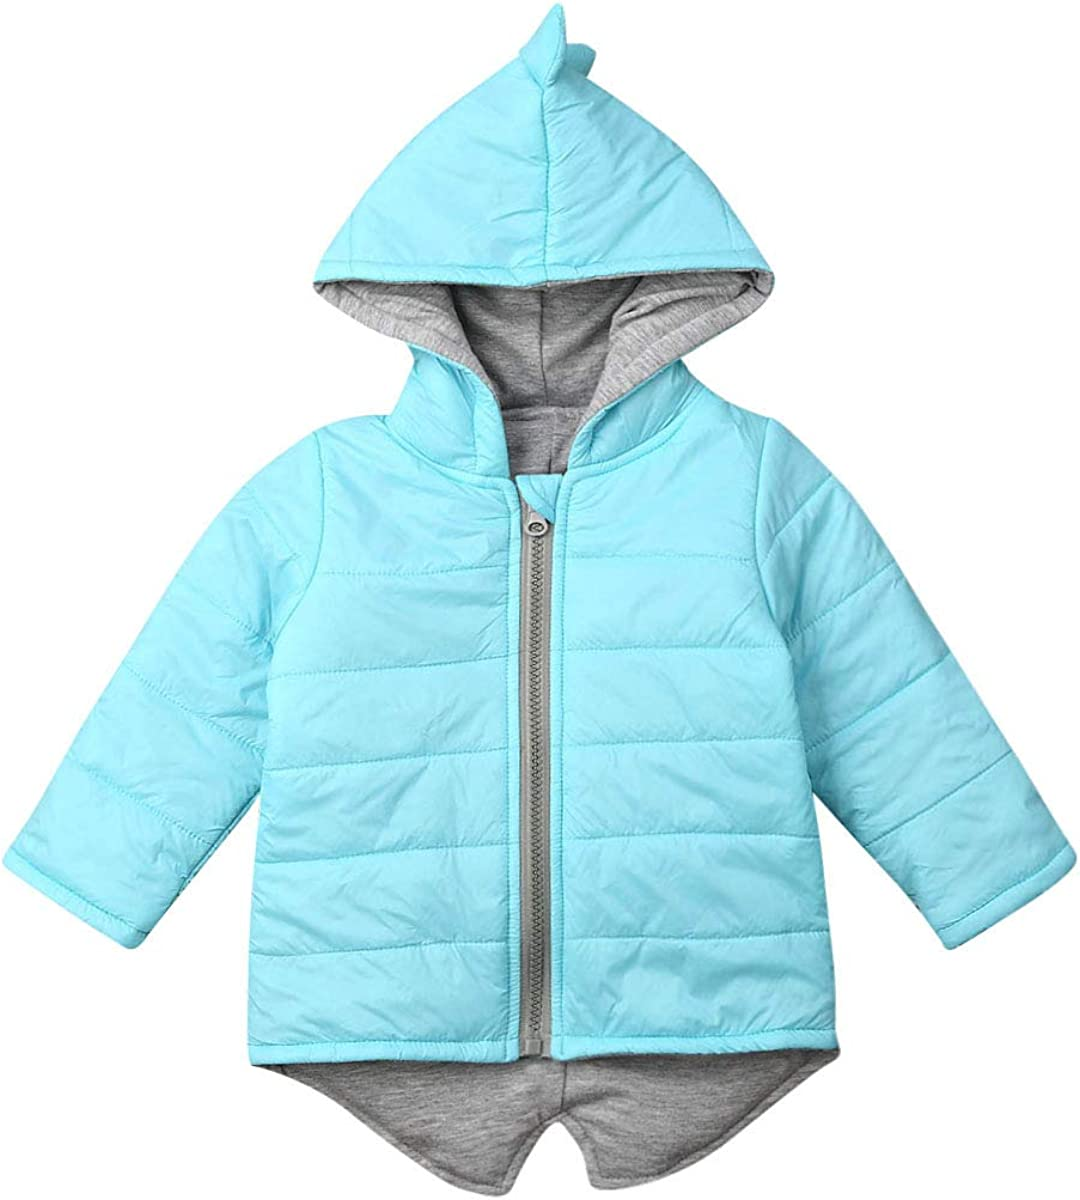 LANTIAN Baby Girls Branded goods Boys Winter Regular store w Lightweight Coats Jacket Hooded